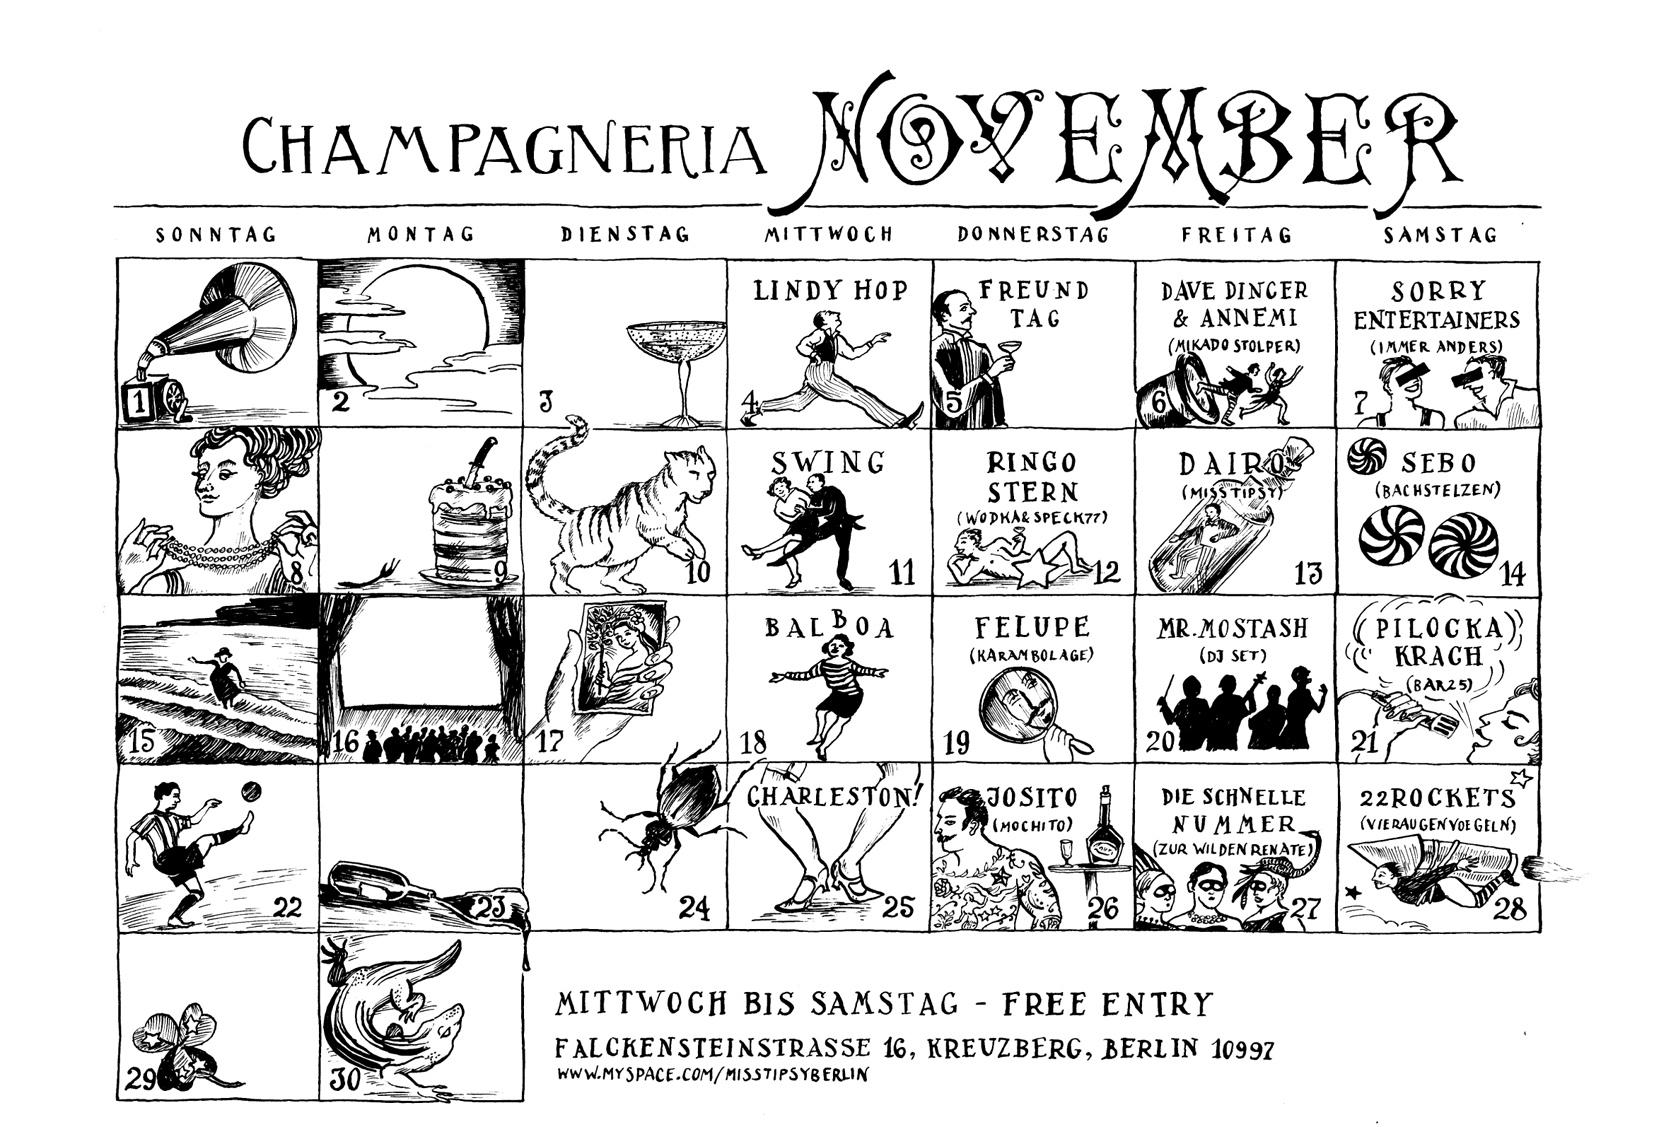 Champagneria November